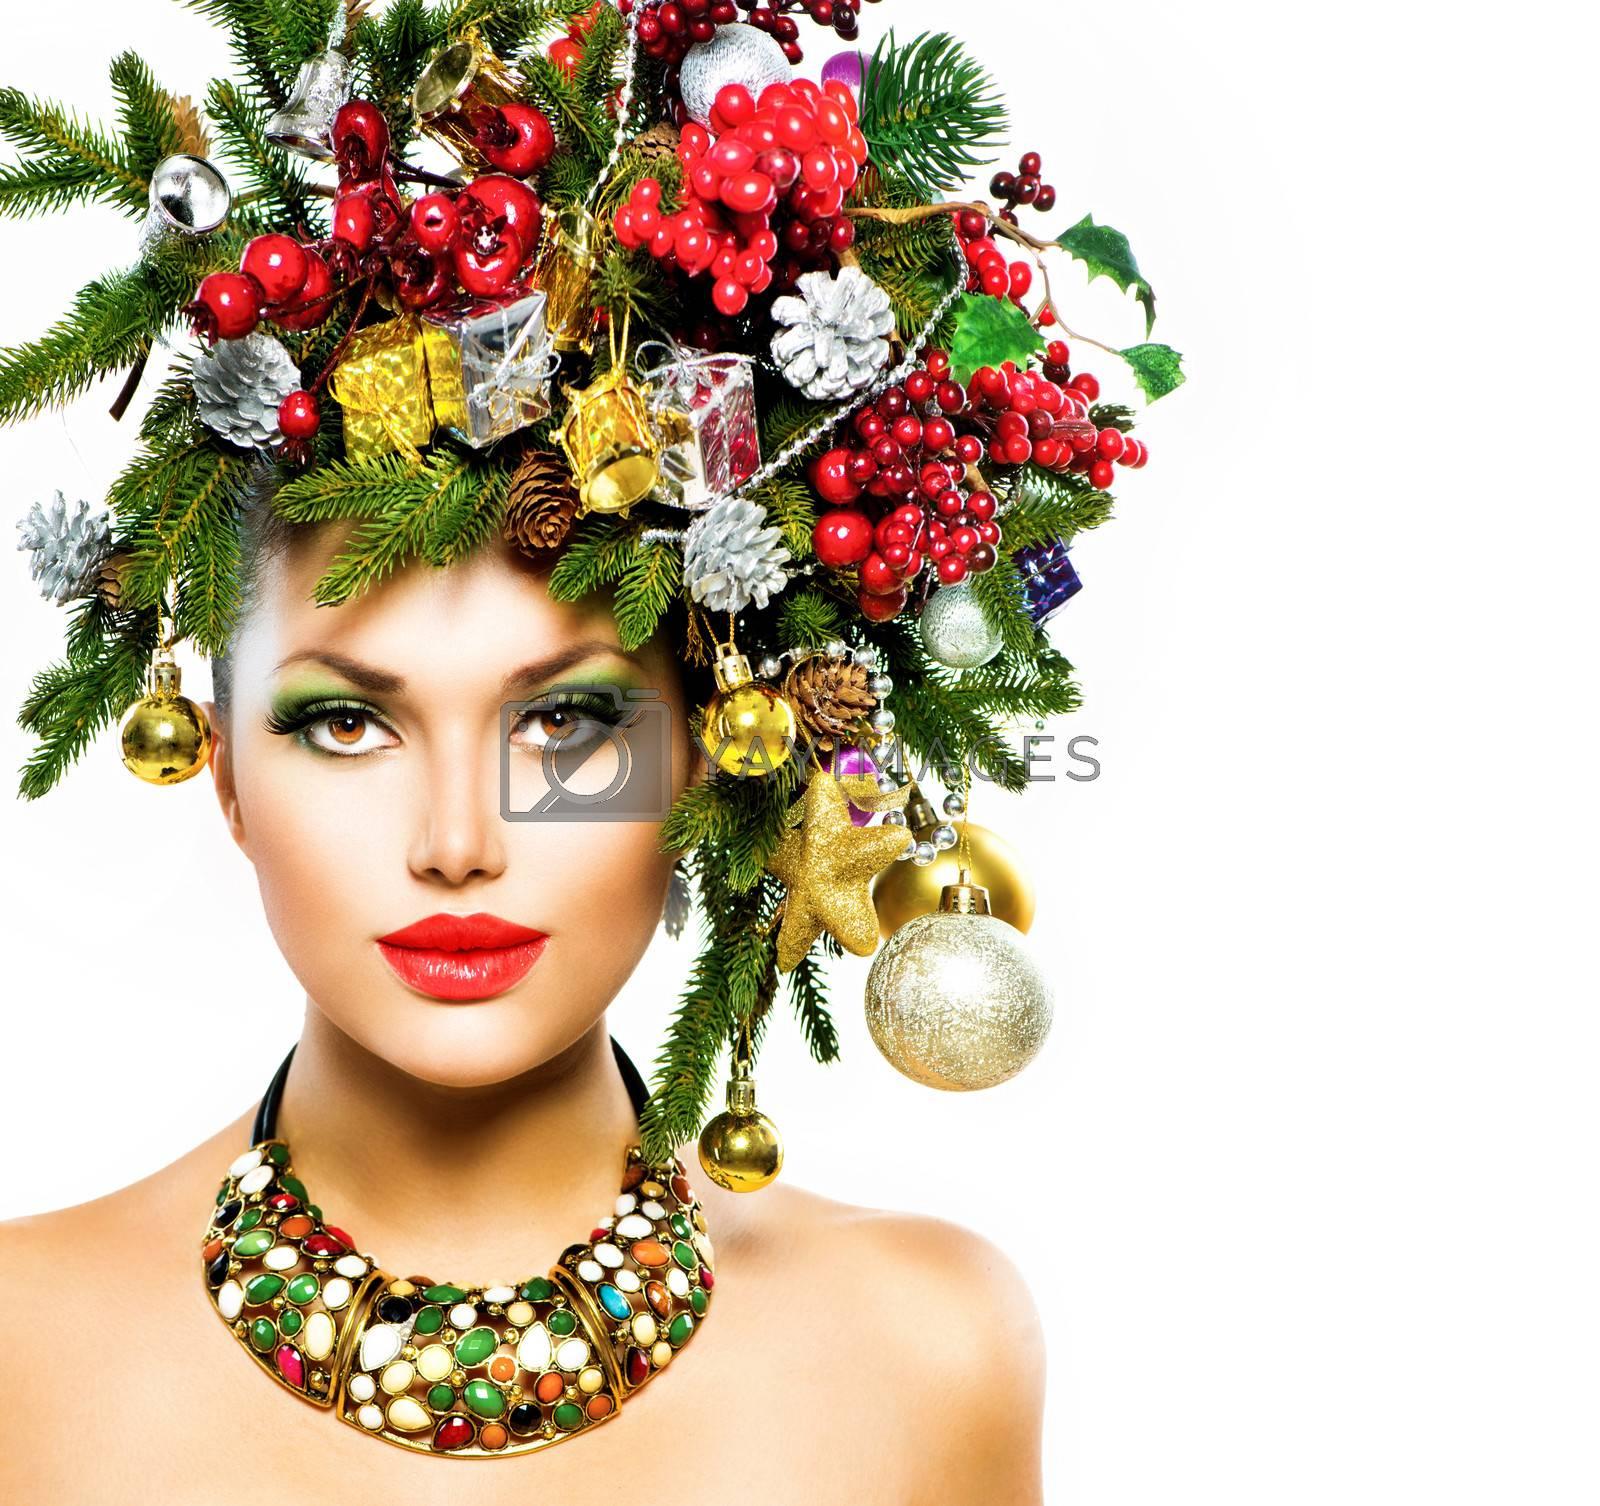 Christmas Woman. Christmas Holiday Hairstyle and Makeup by SubbotinaA